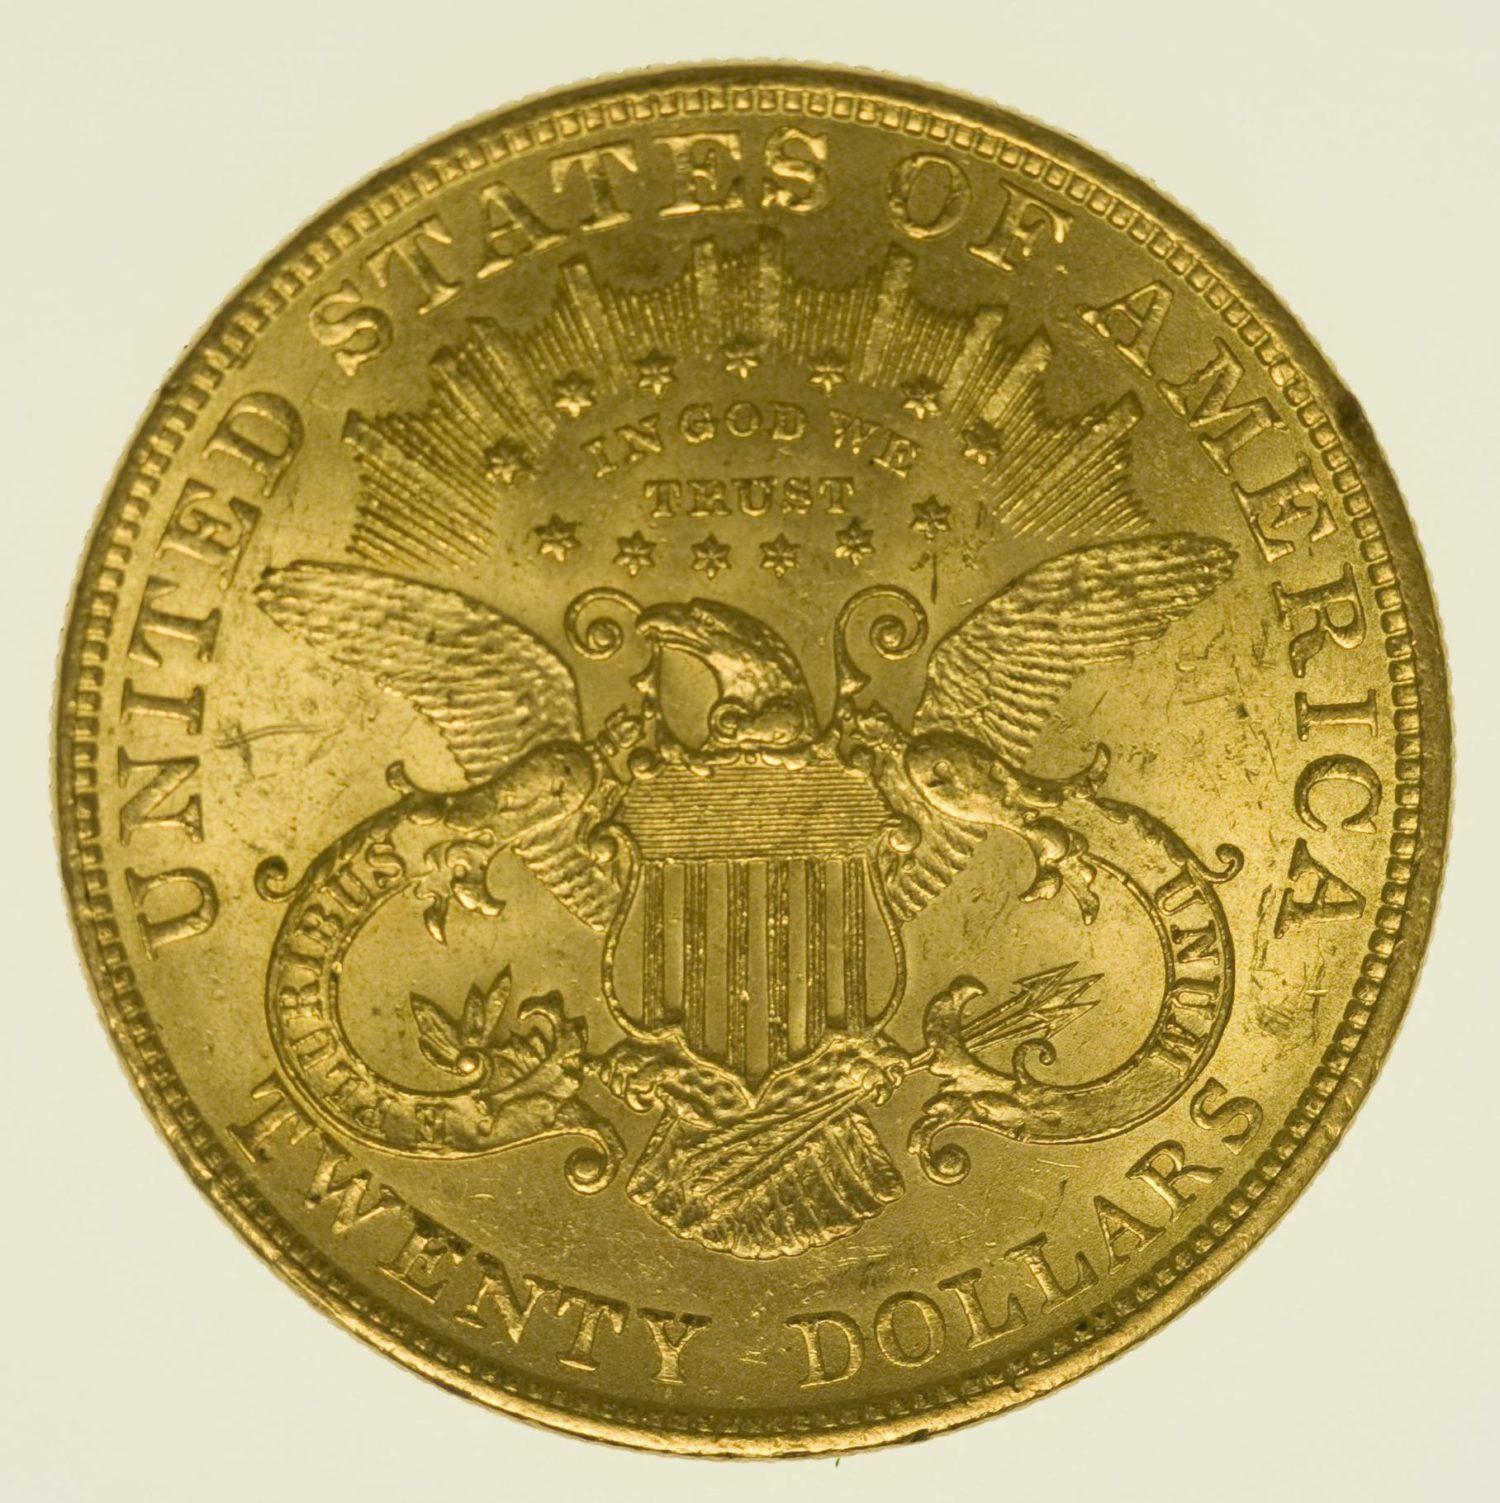 USA 20 Dollars 1898 Liberty / Kopf Gold 30,09 Gramm fein RAR